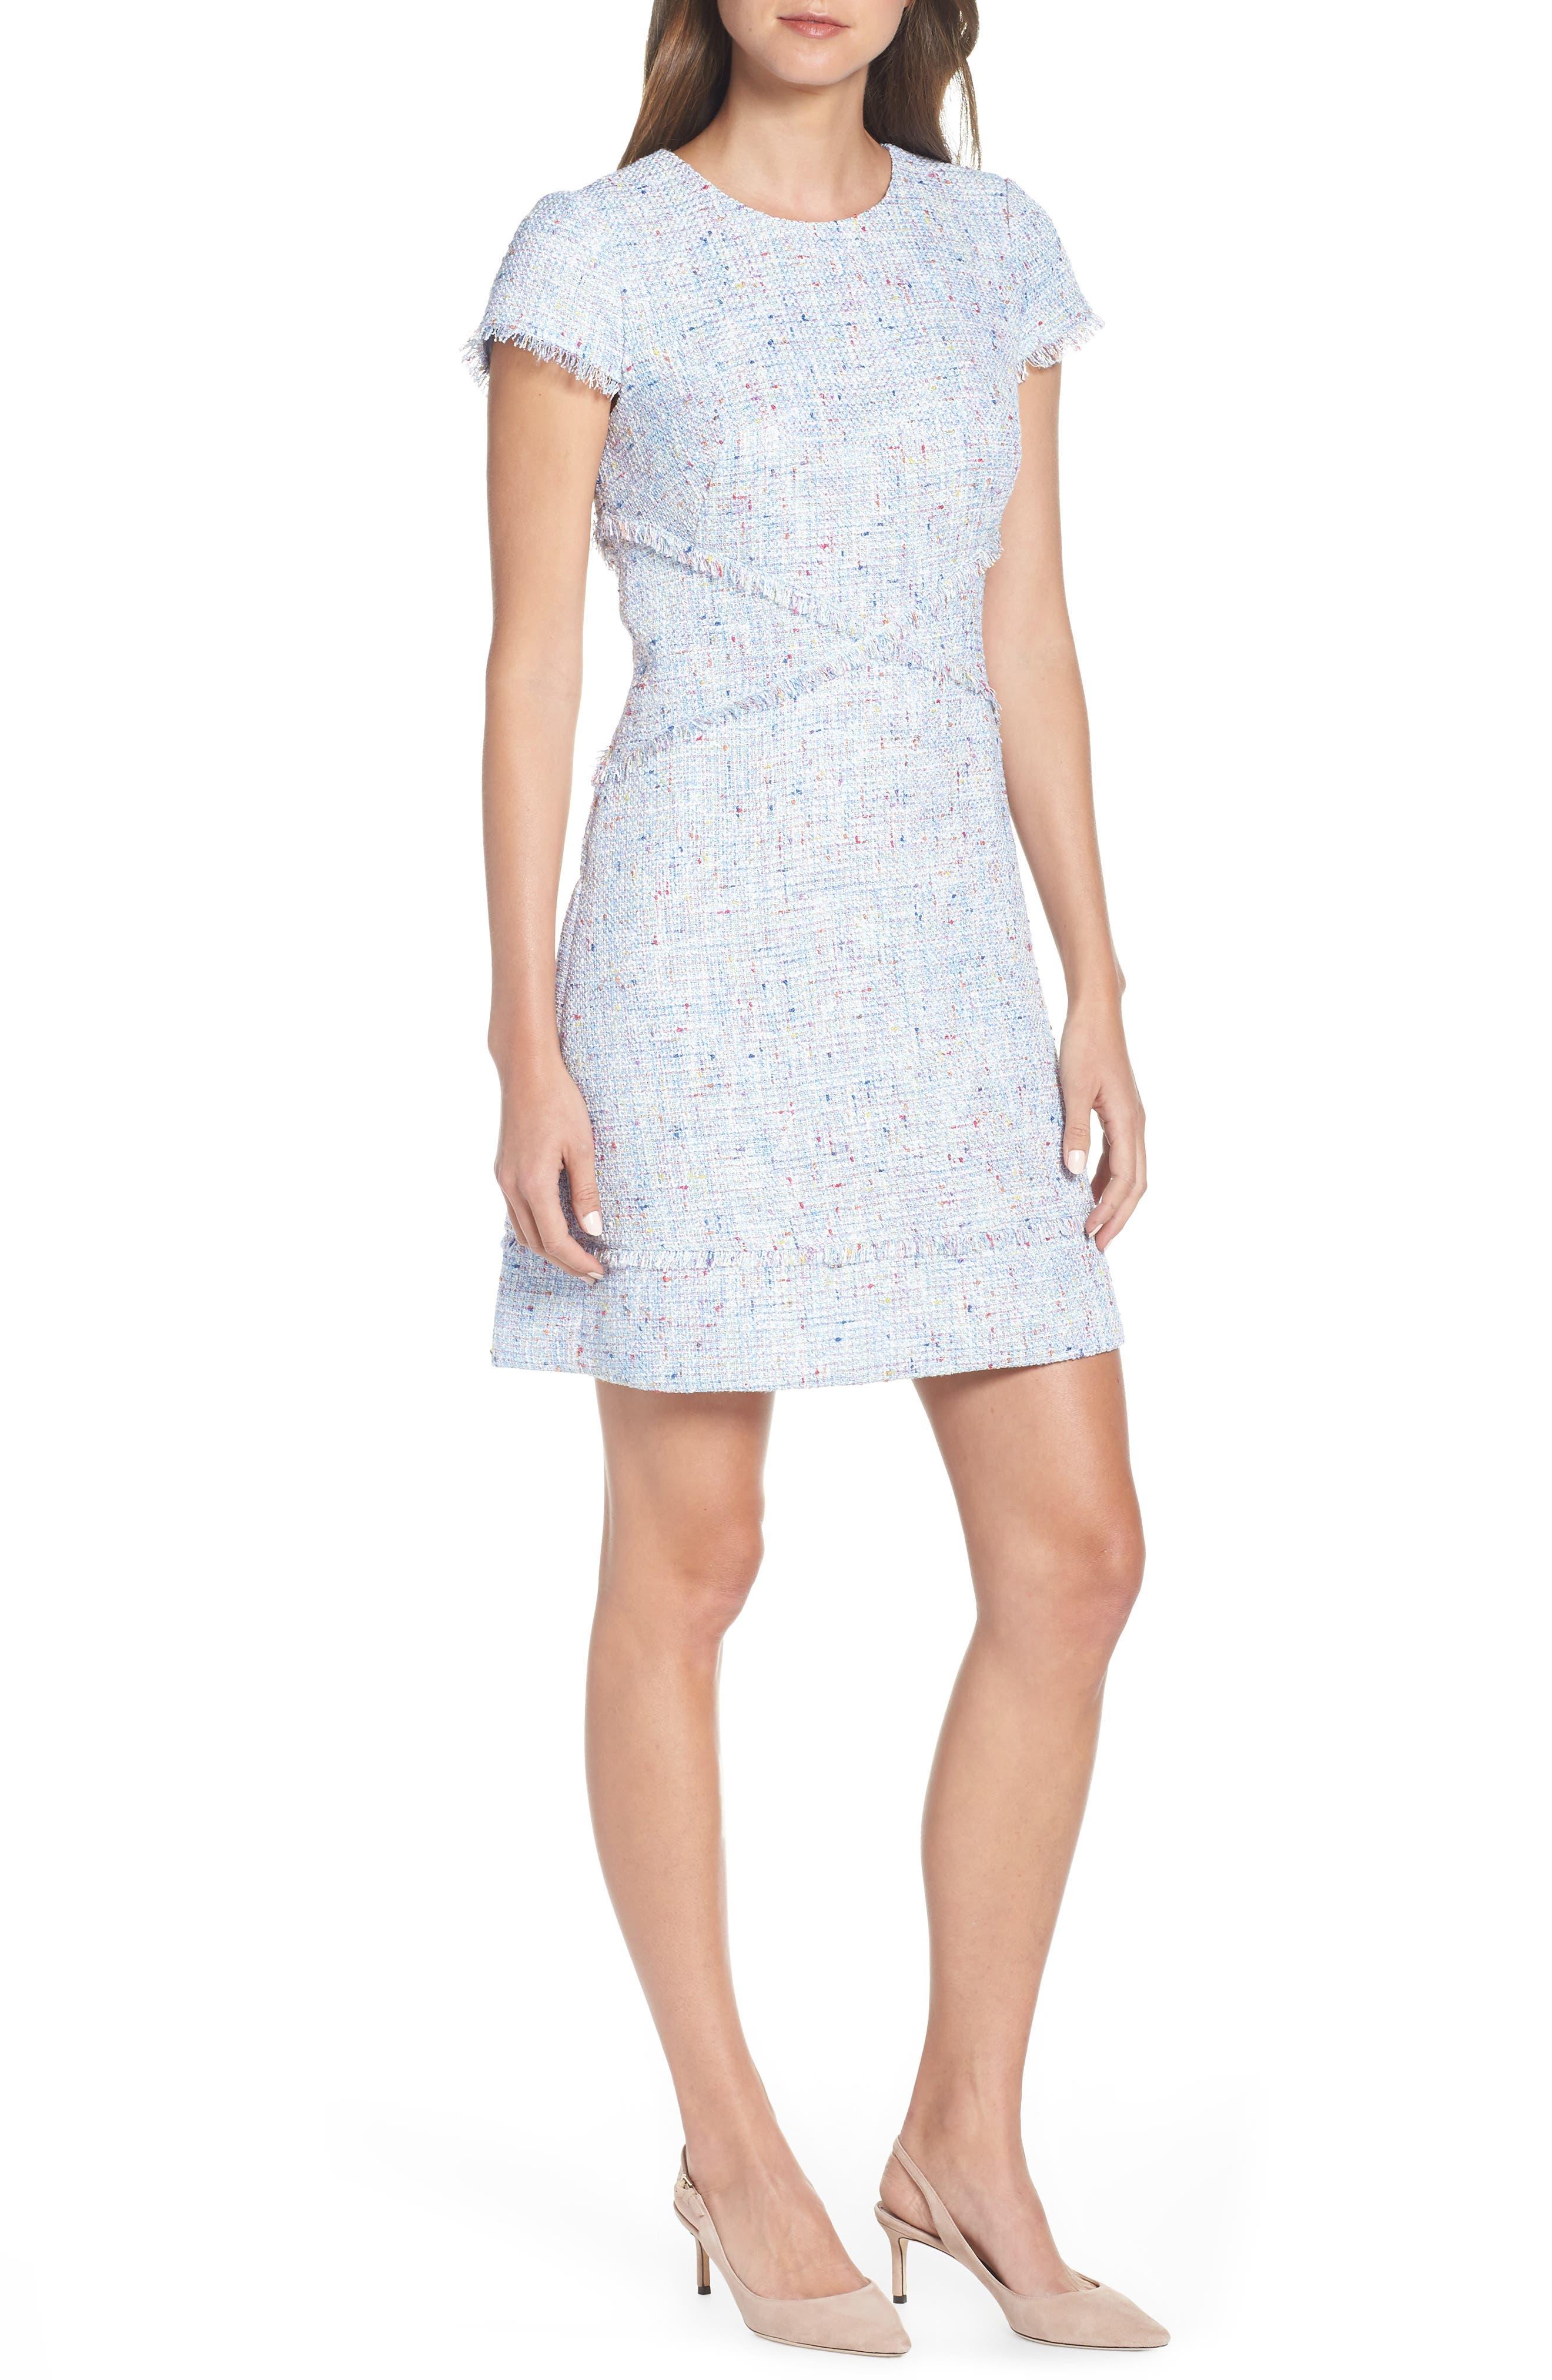 ELIZA J, Sheath Tweed Sheath Dress, Main thumbnail 1, color, BLUE